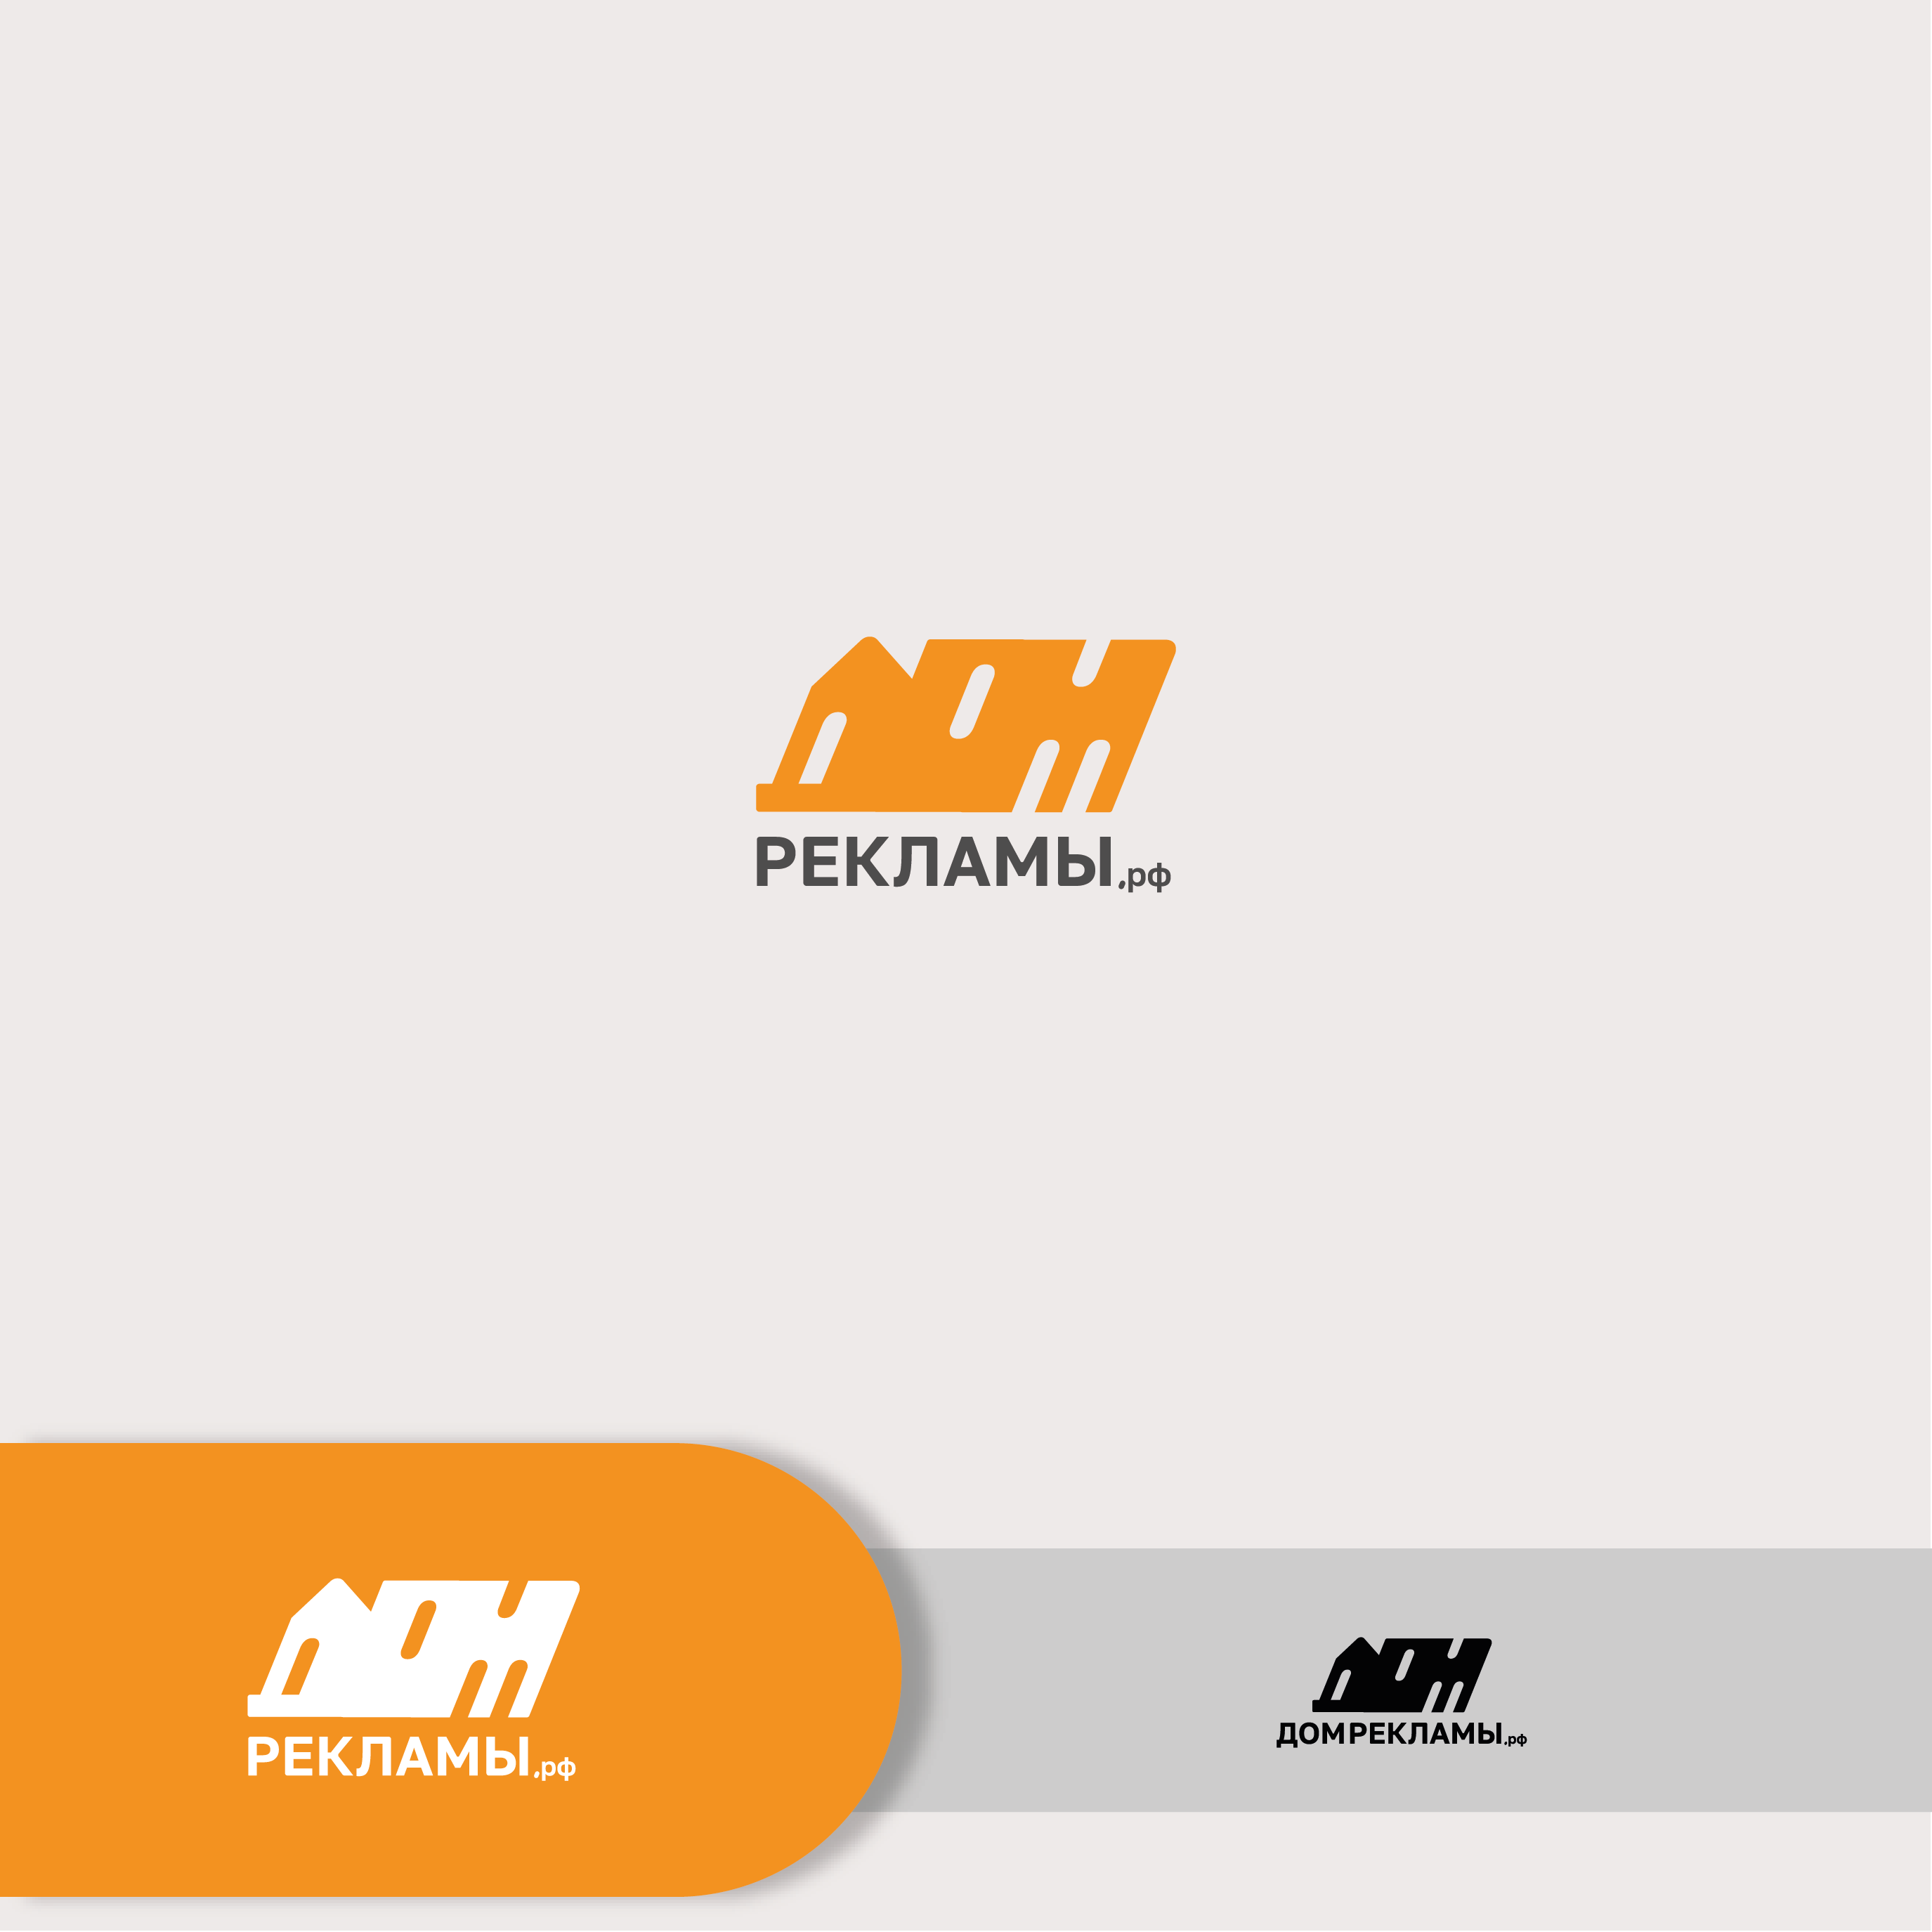 Дизайн логотипа рекламно-производственной компании фото f_9475edcc5fc49170.png